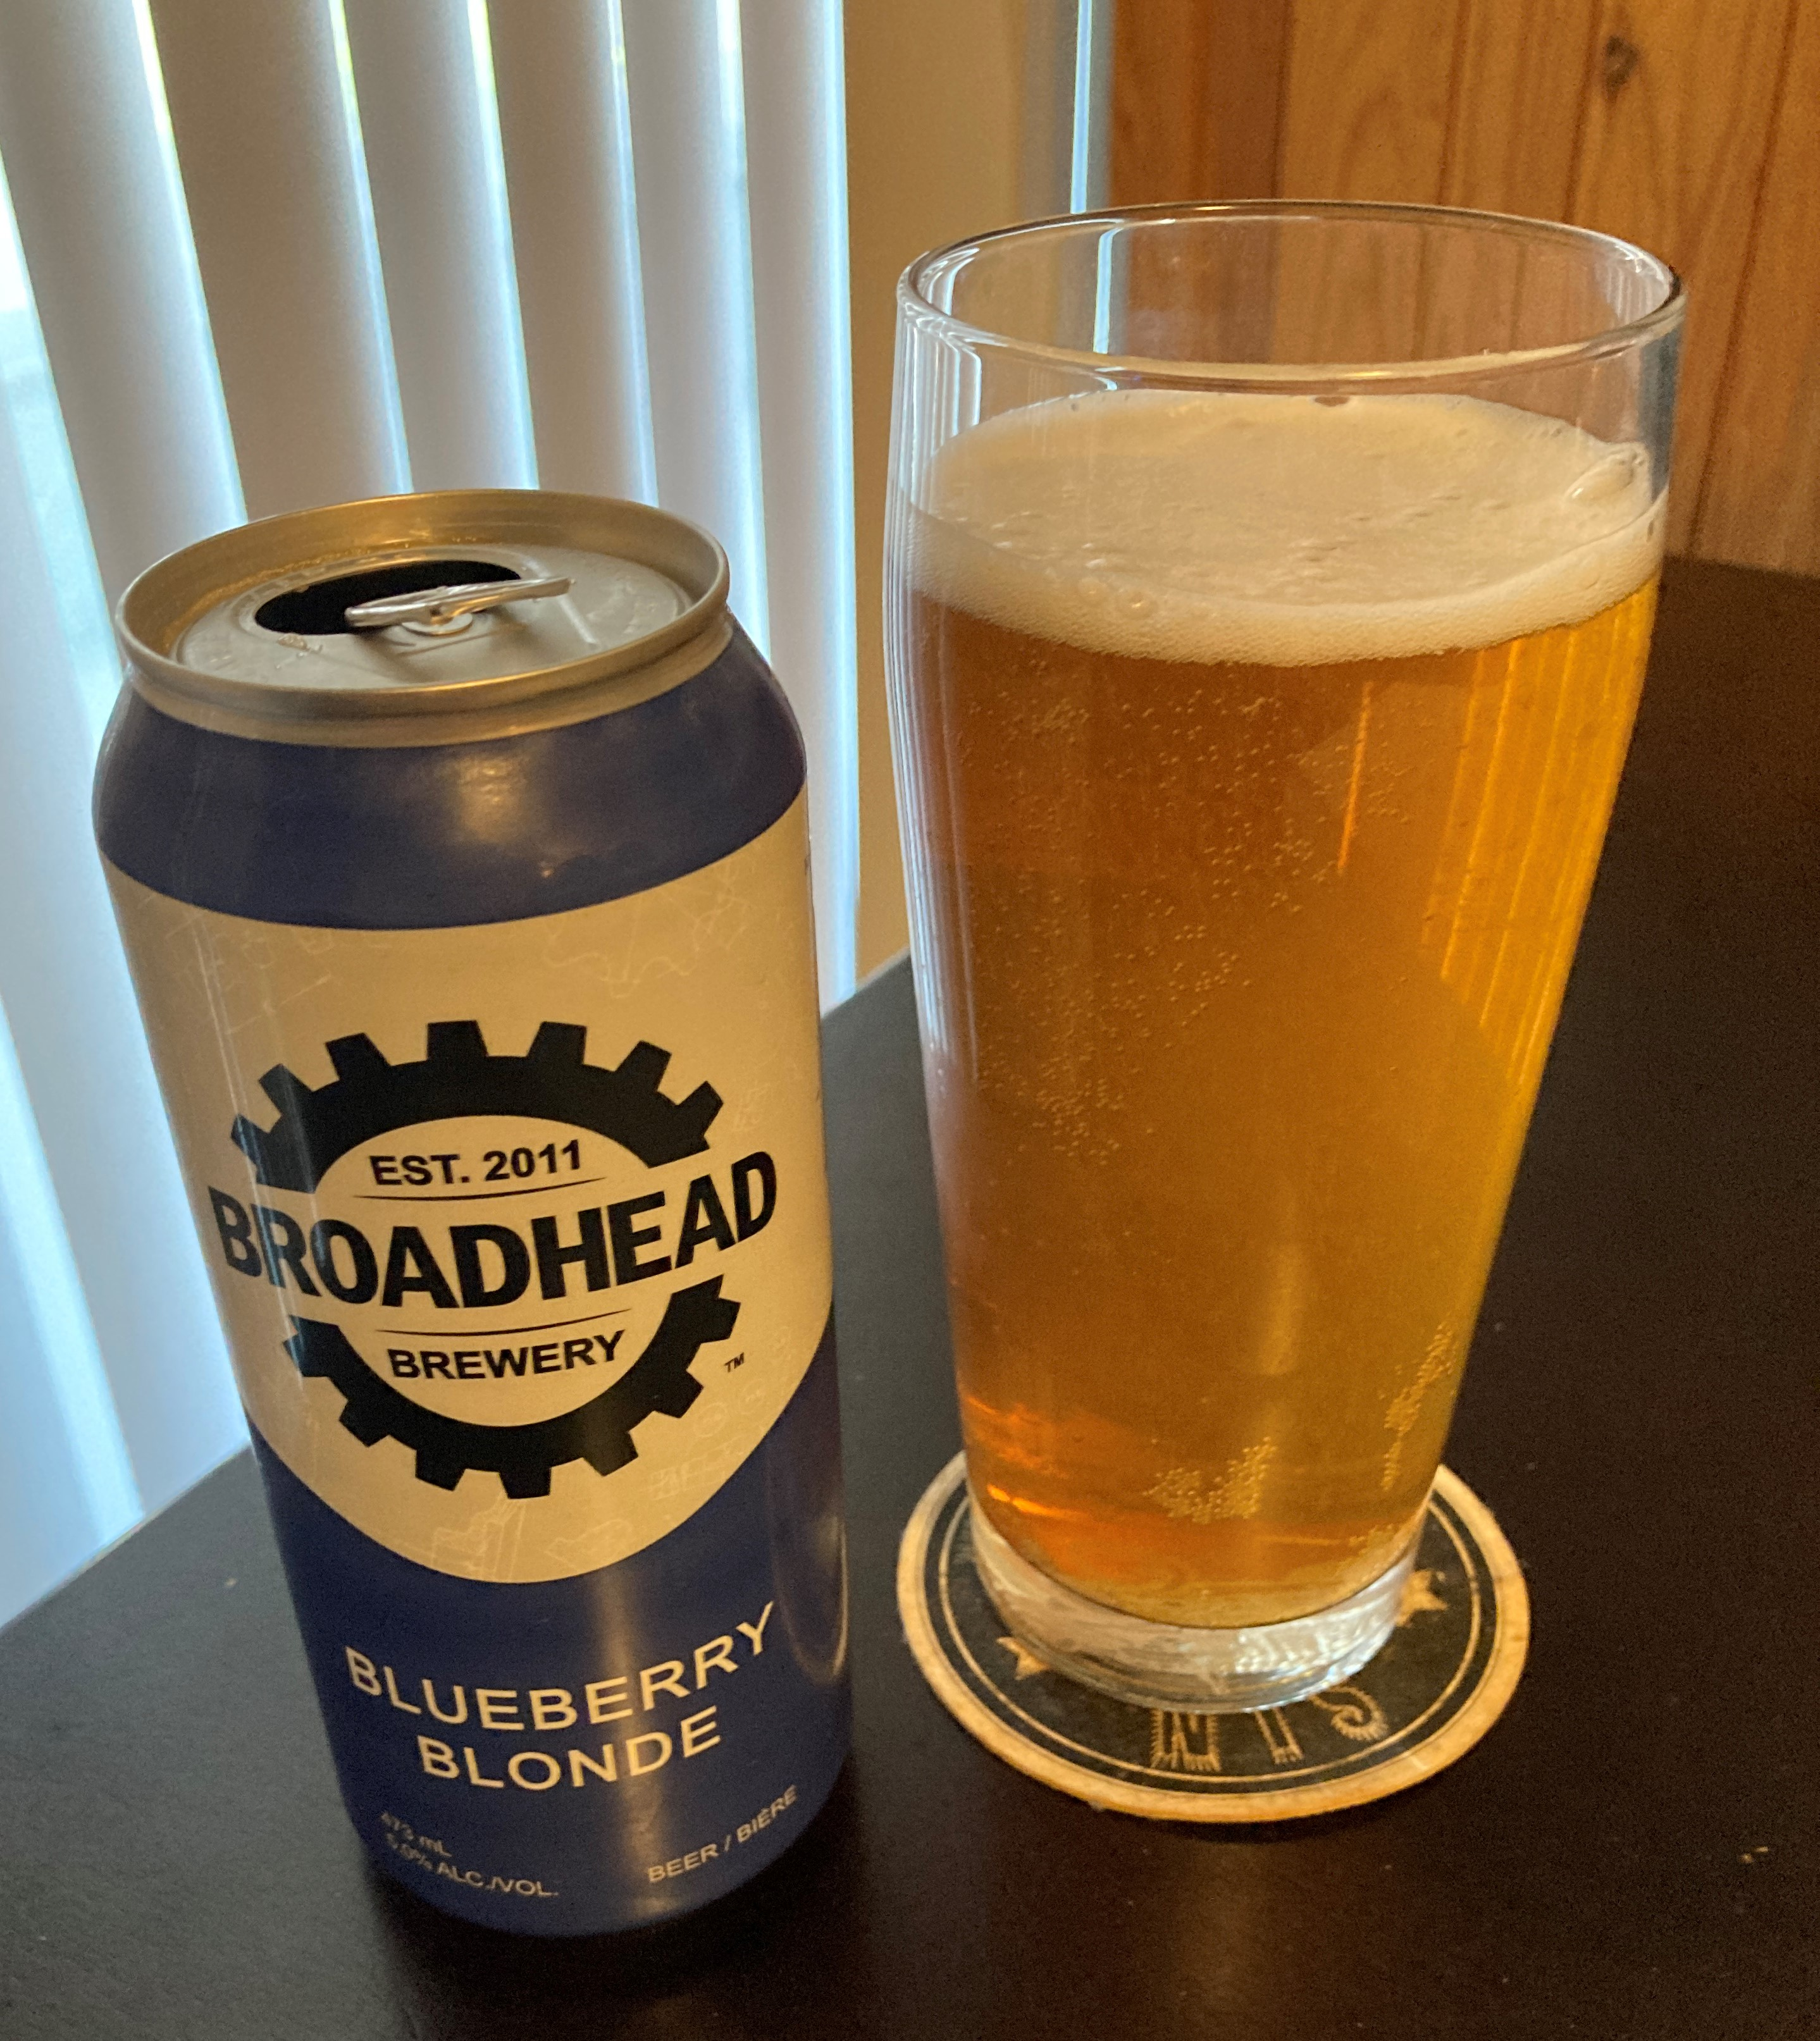 broadhead_blueberry_blonde (9)